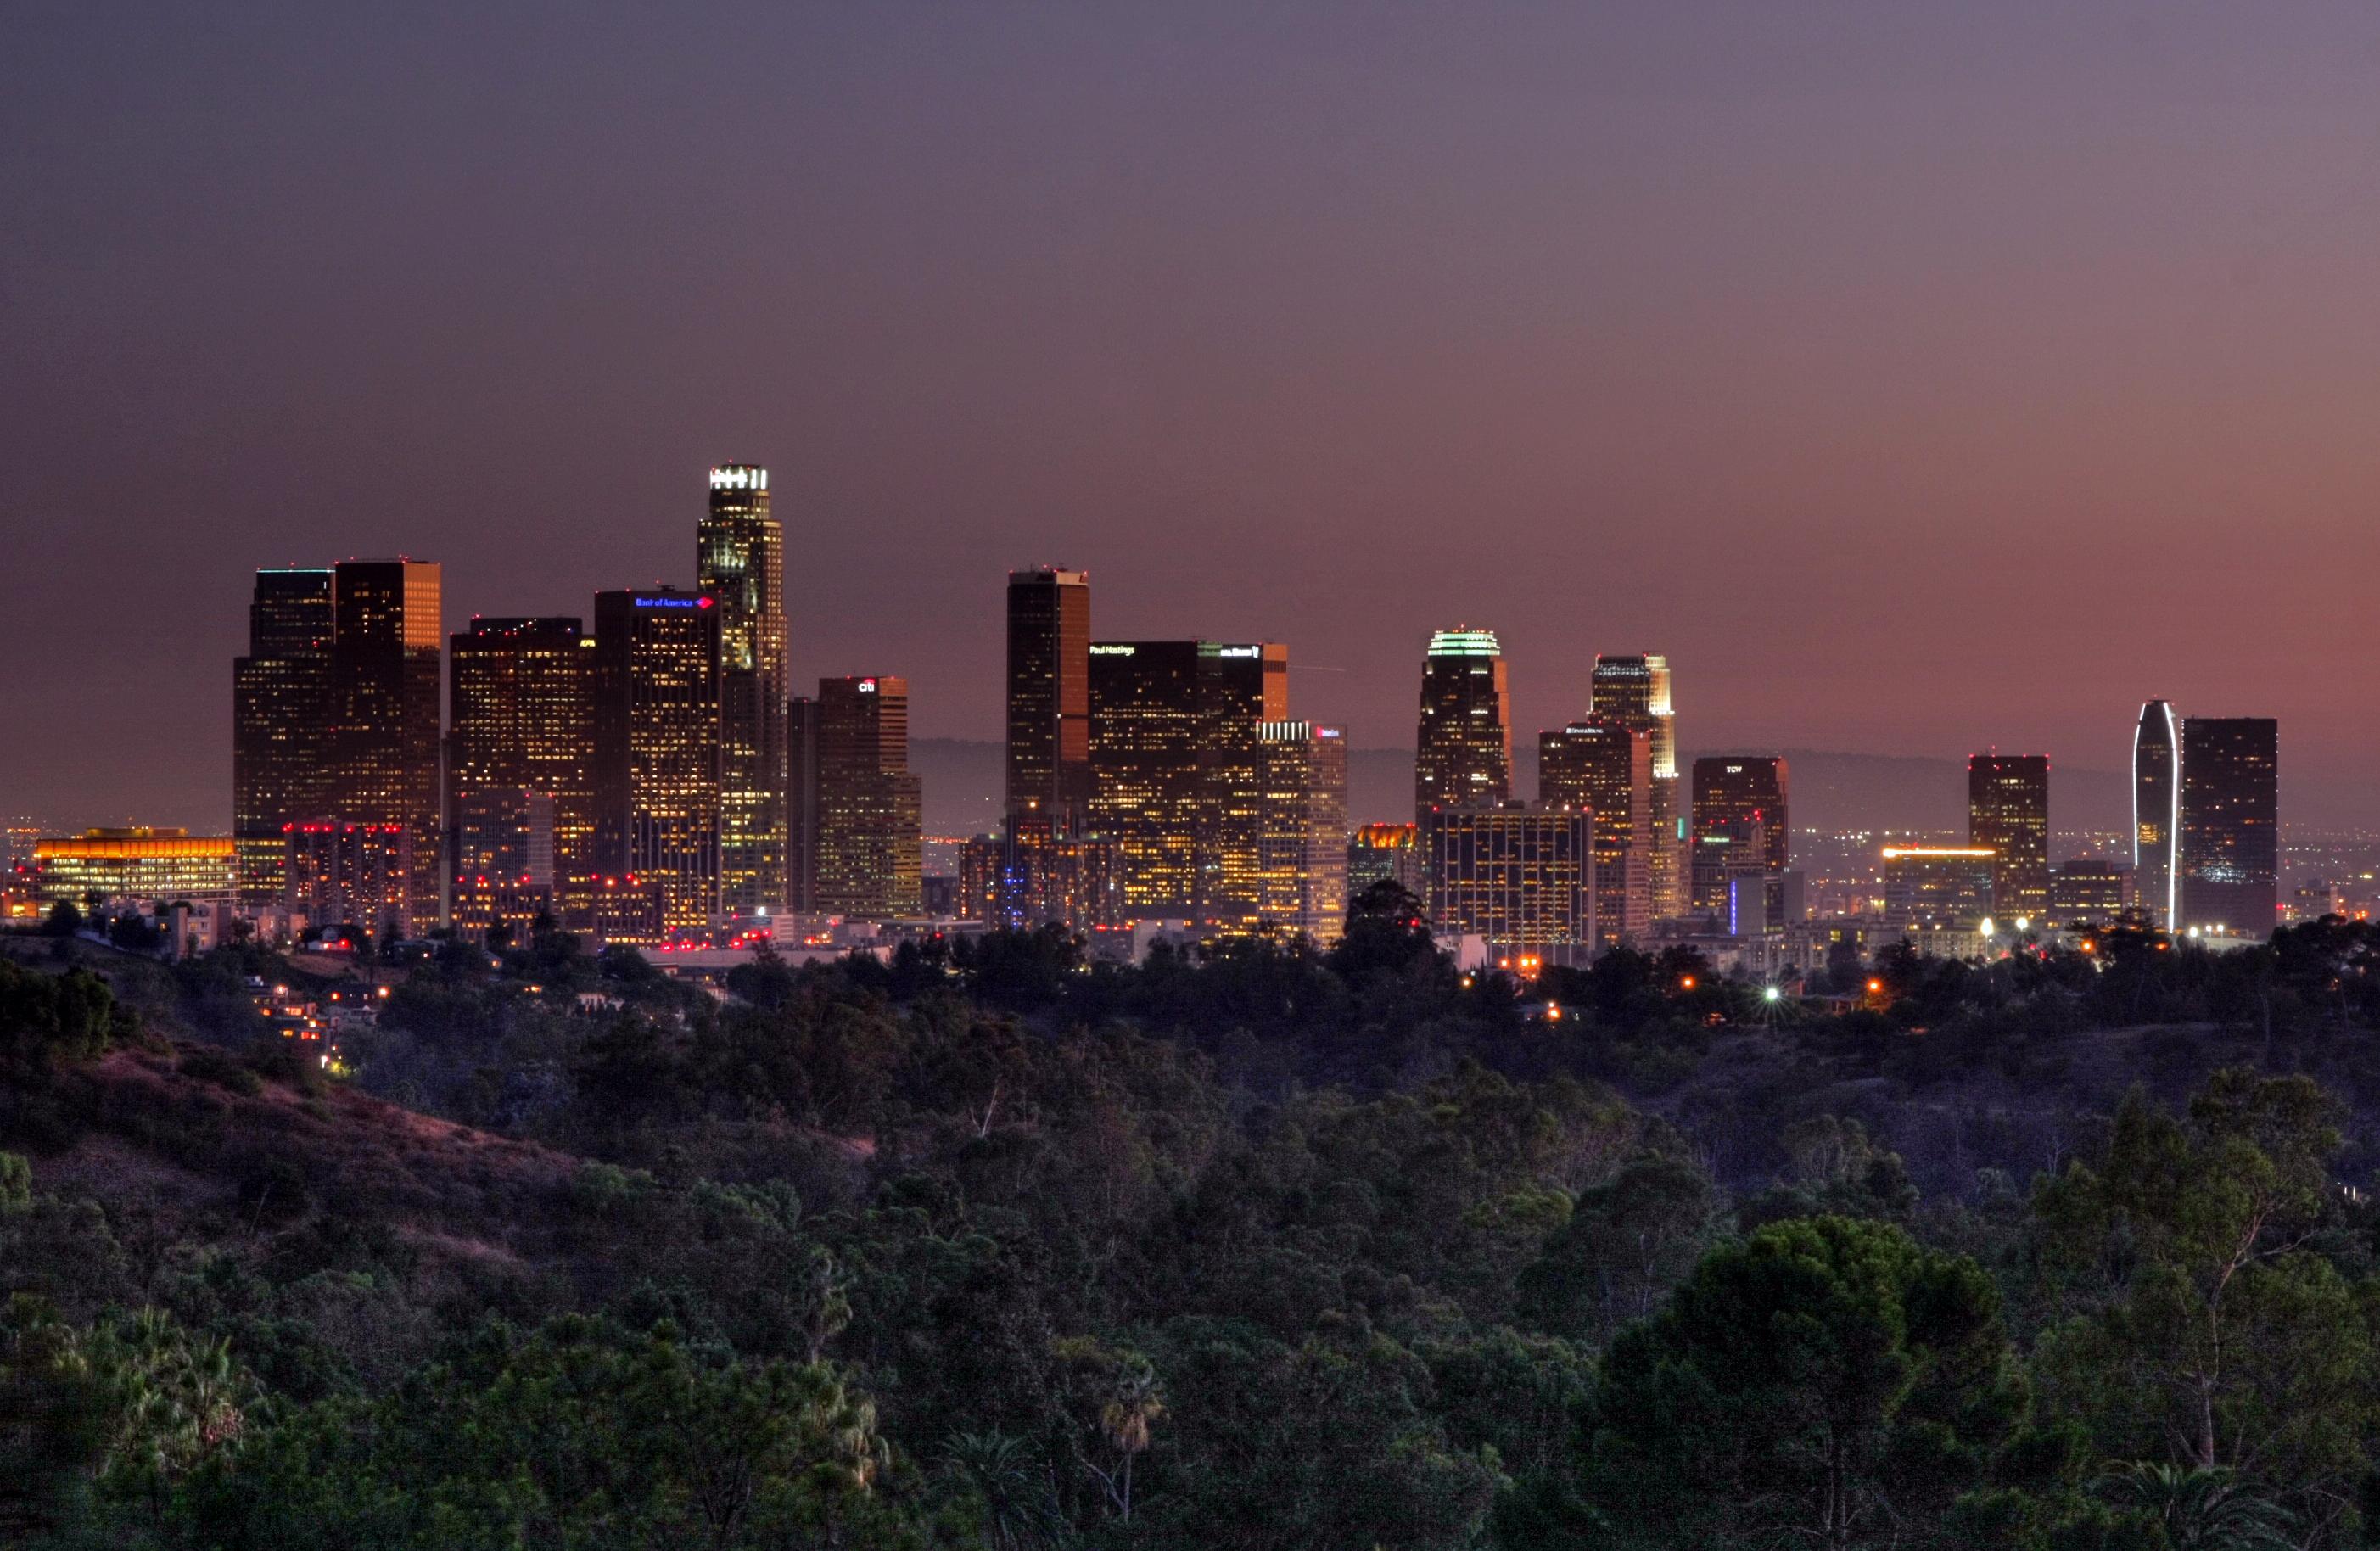 los angeles skyline view - photo #22